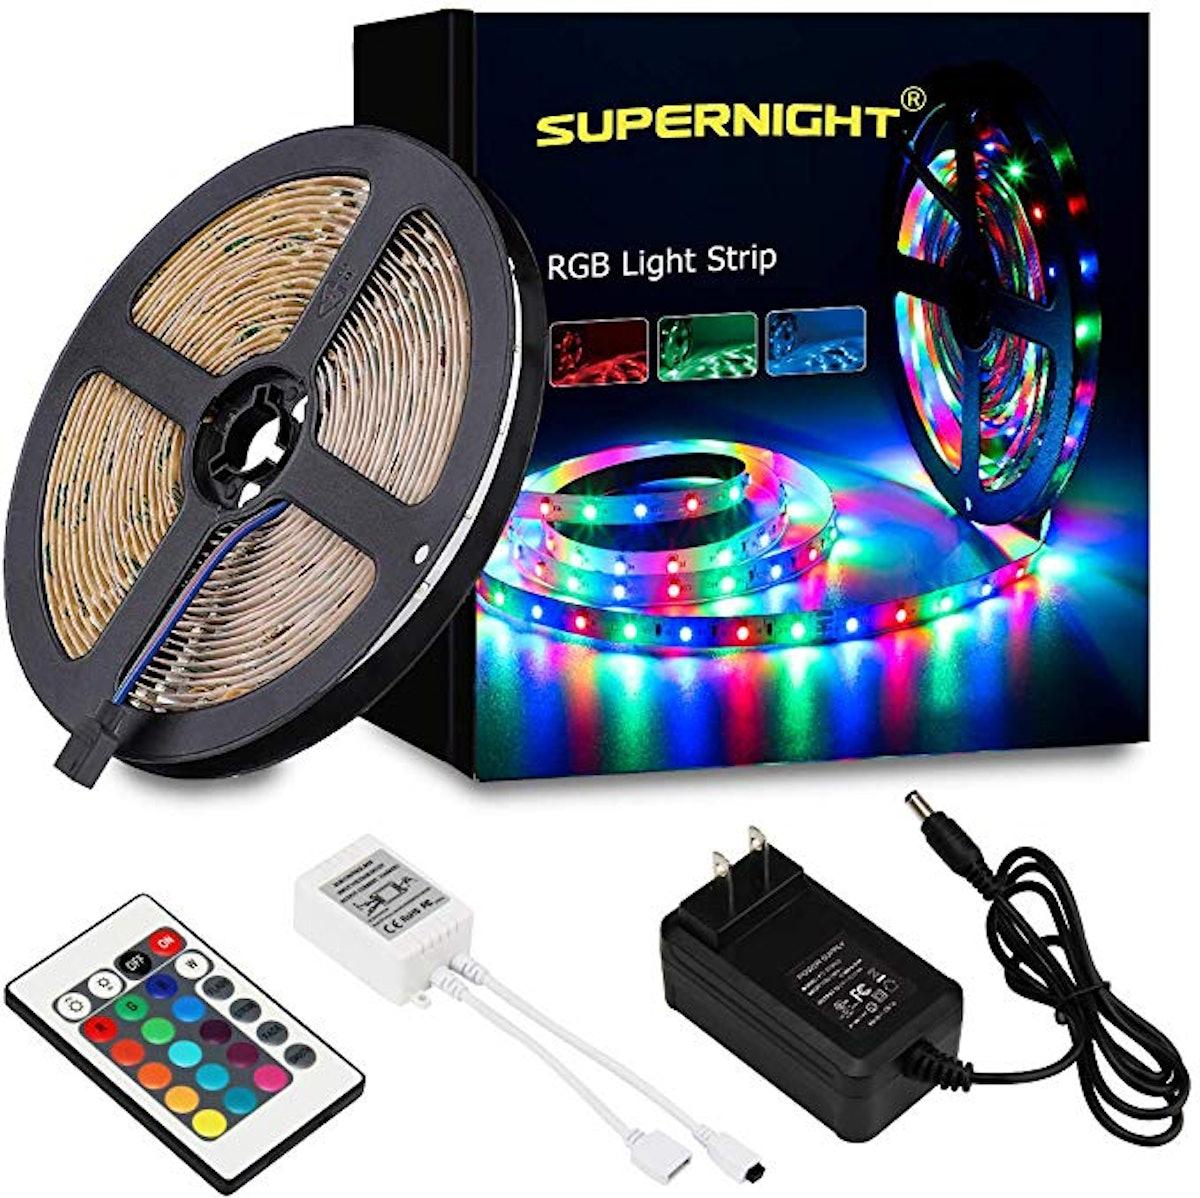 SUPERNIGHT LED Strip Lights